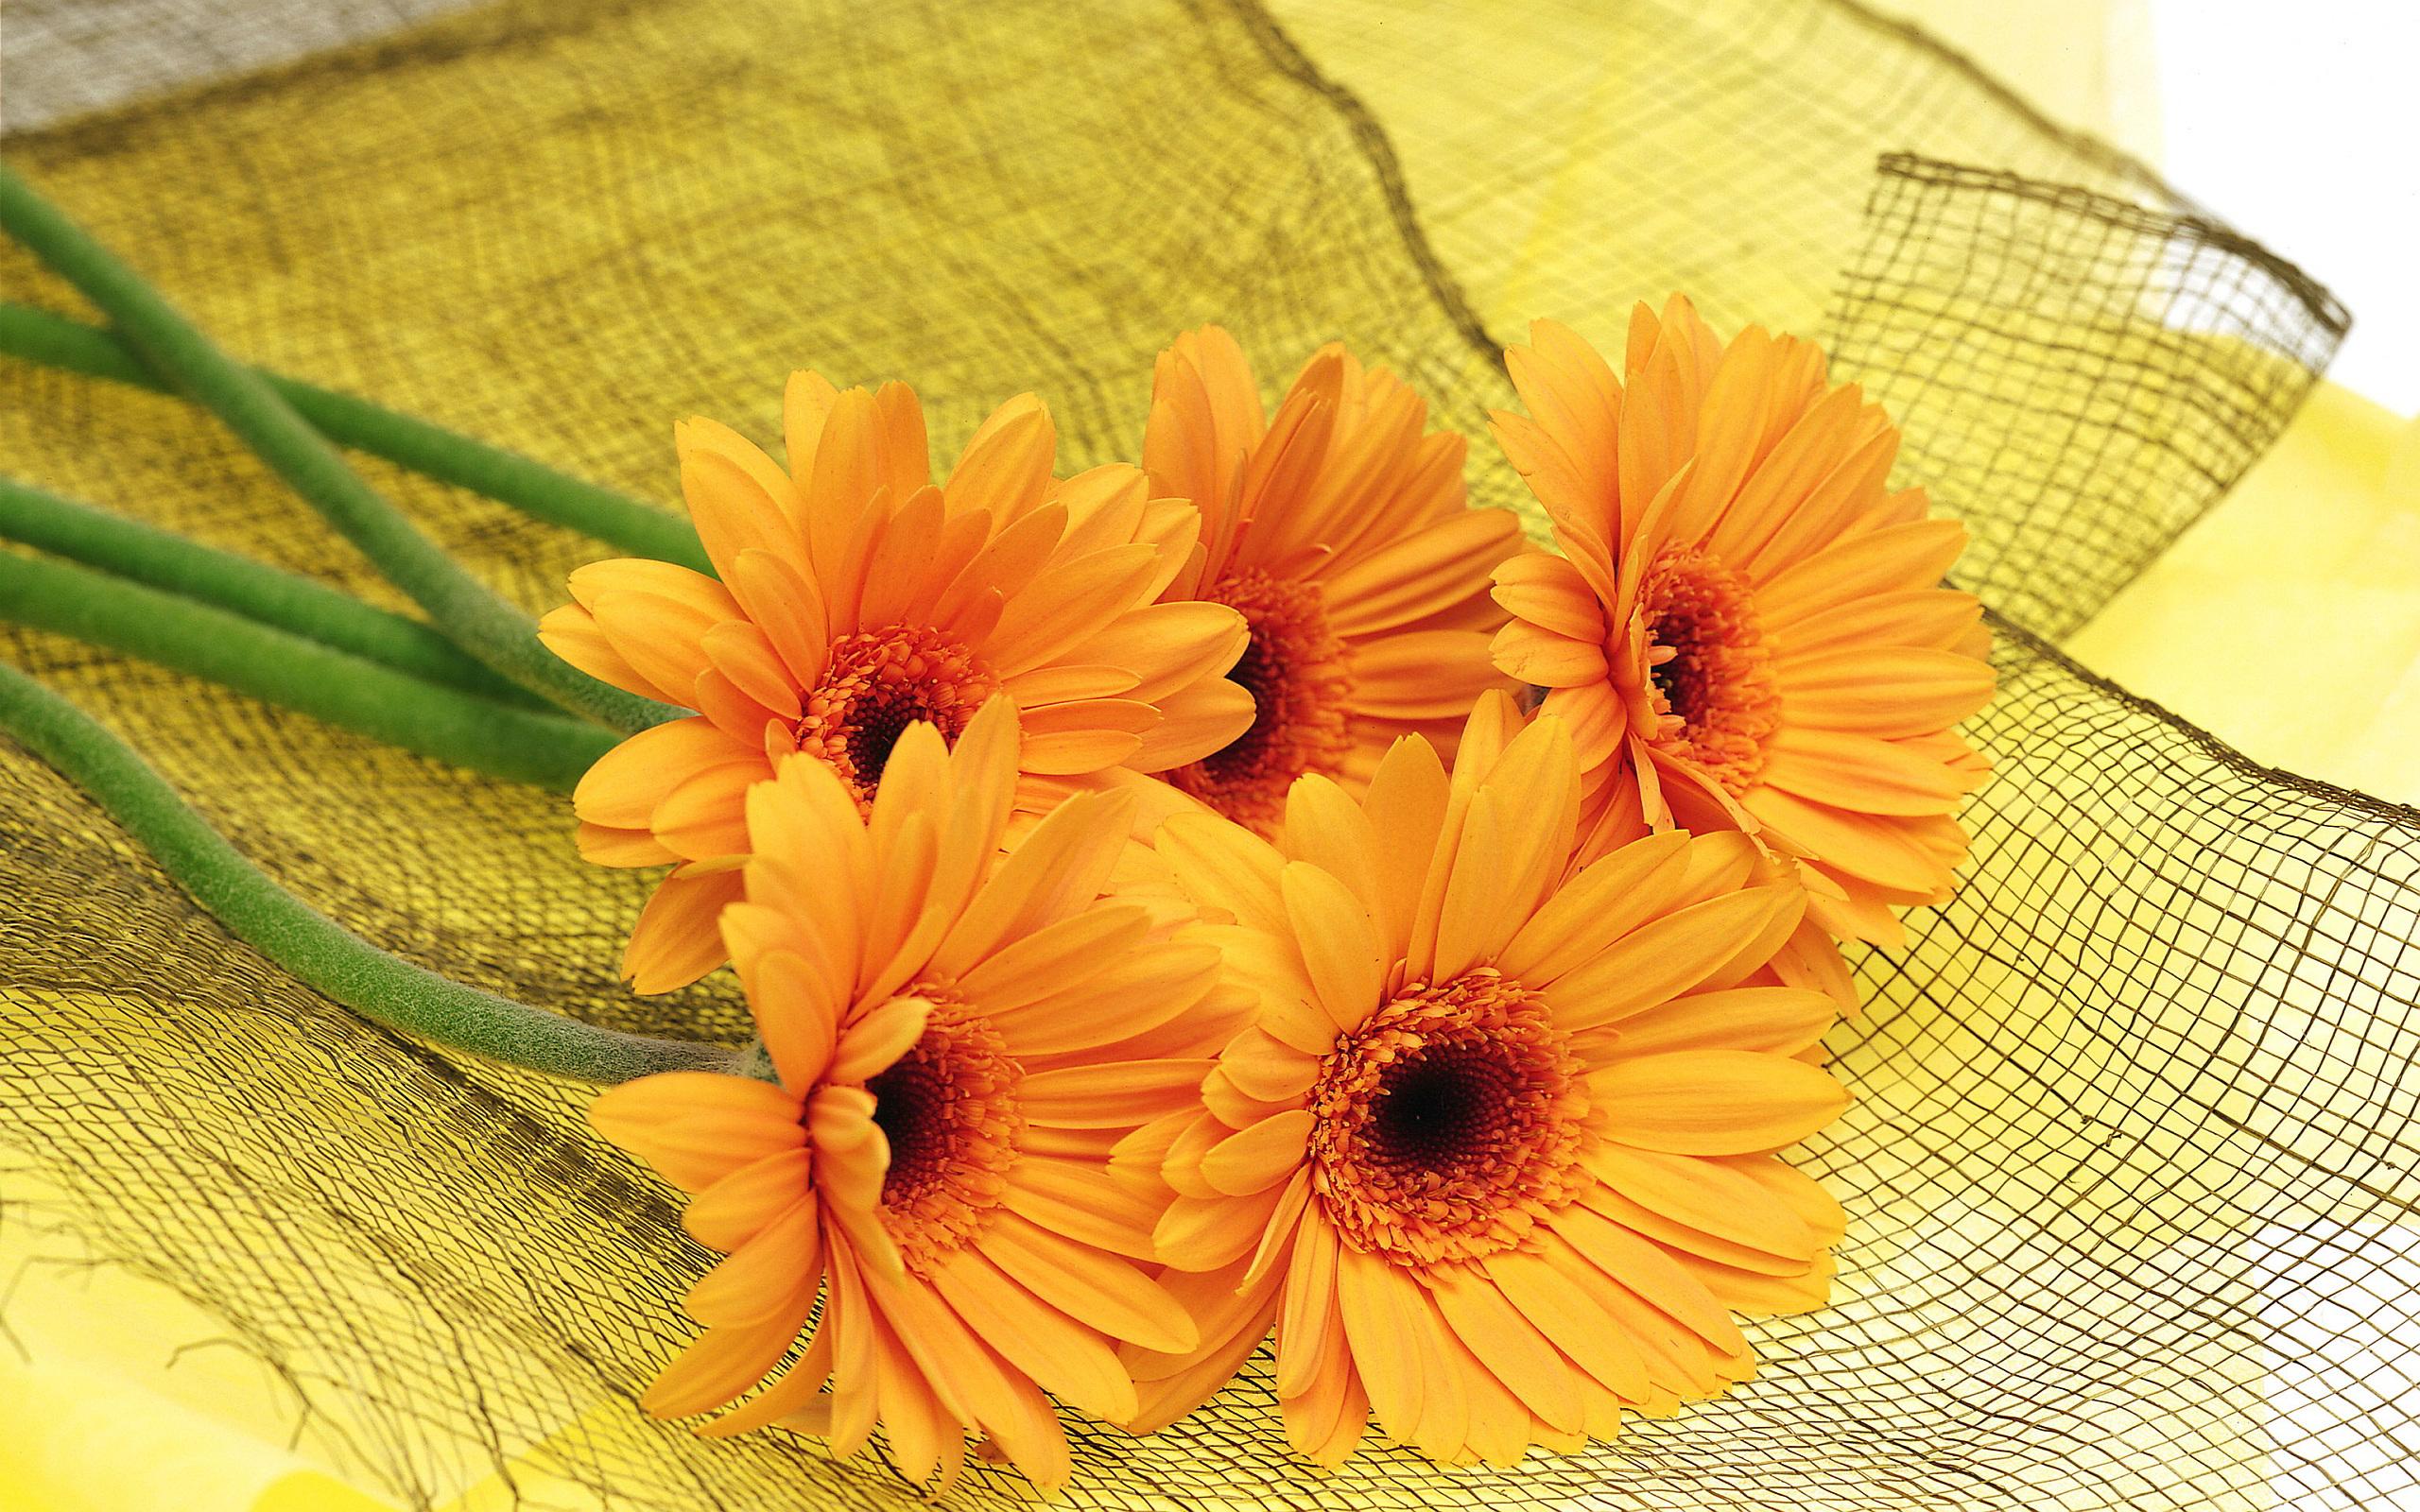 Lovely Orange Flowers Wallpaper 846603 2560x1600px By Slavasan Lynam